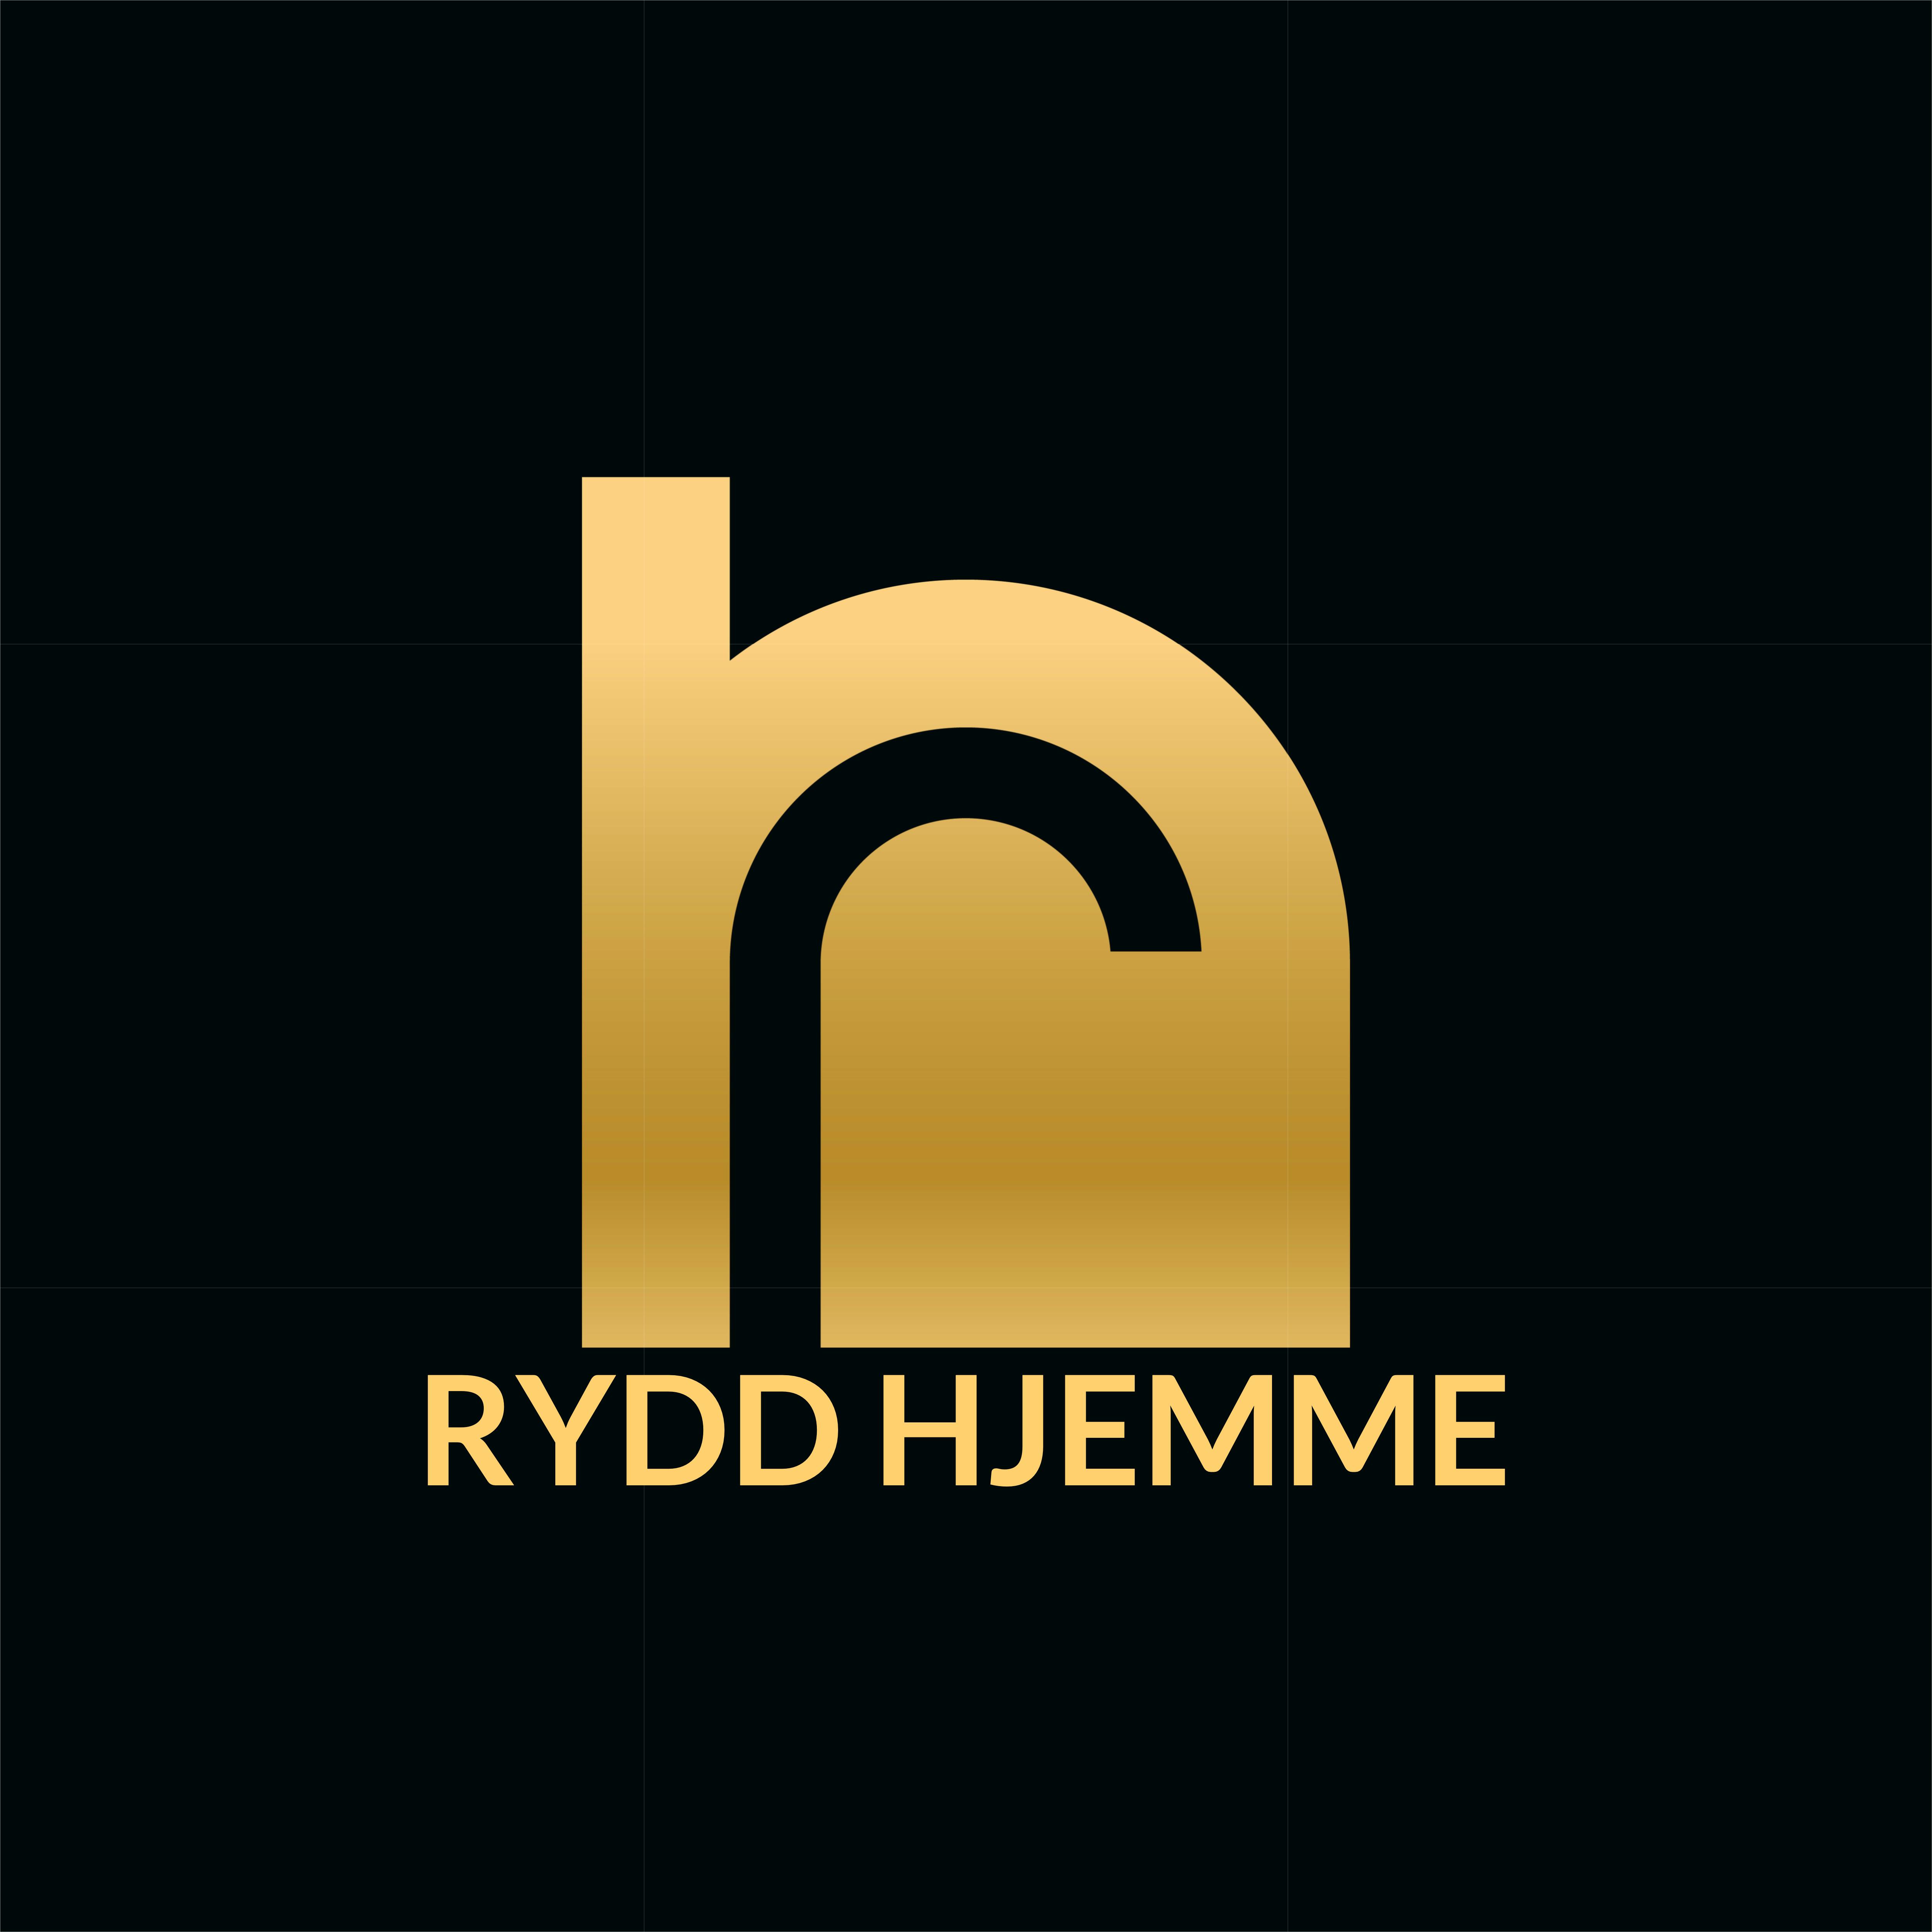 RYDD HJEMME